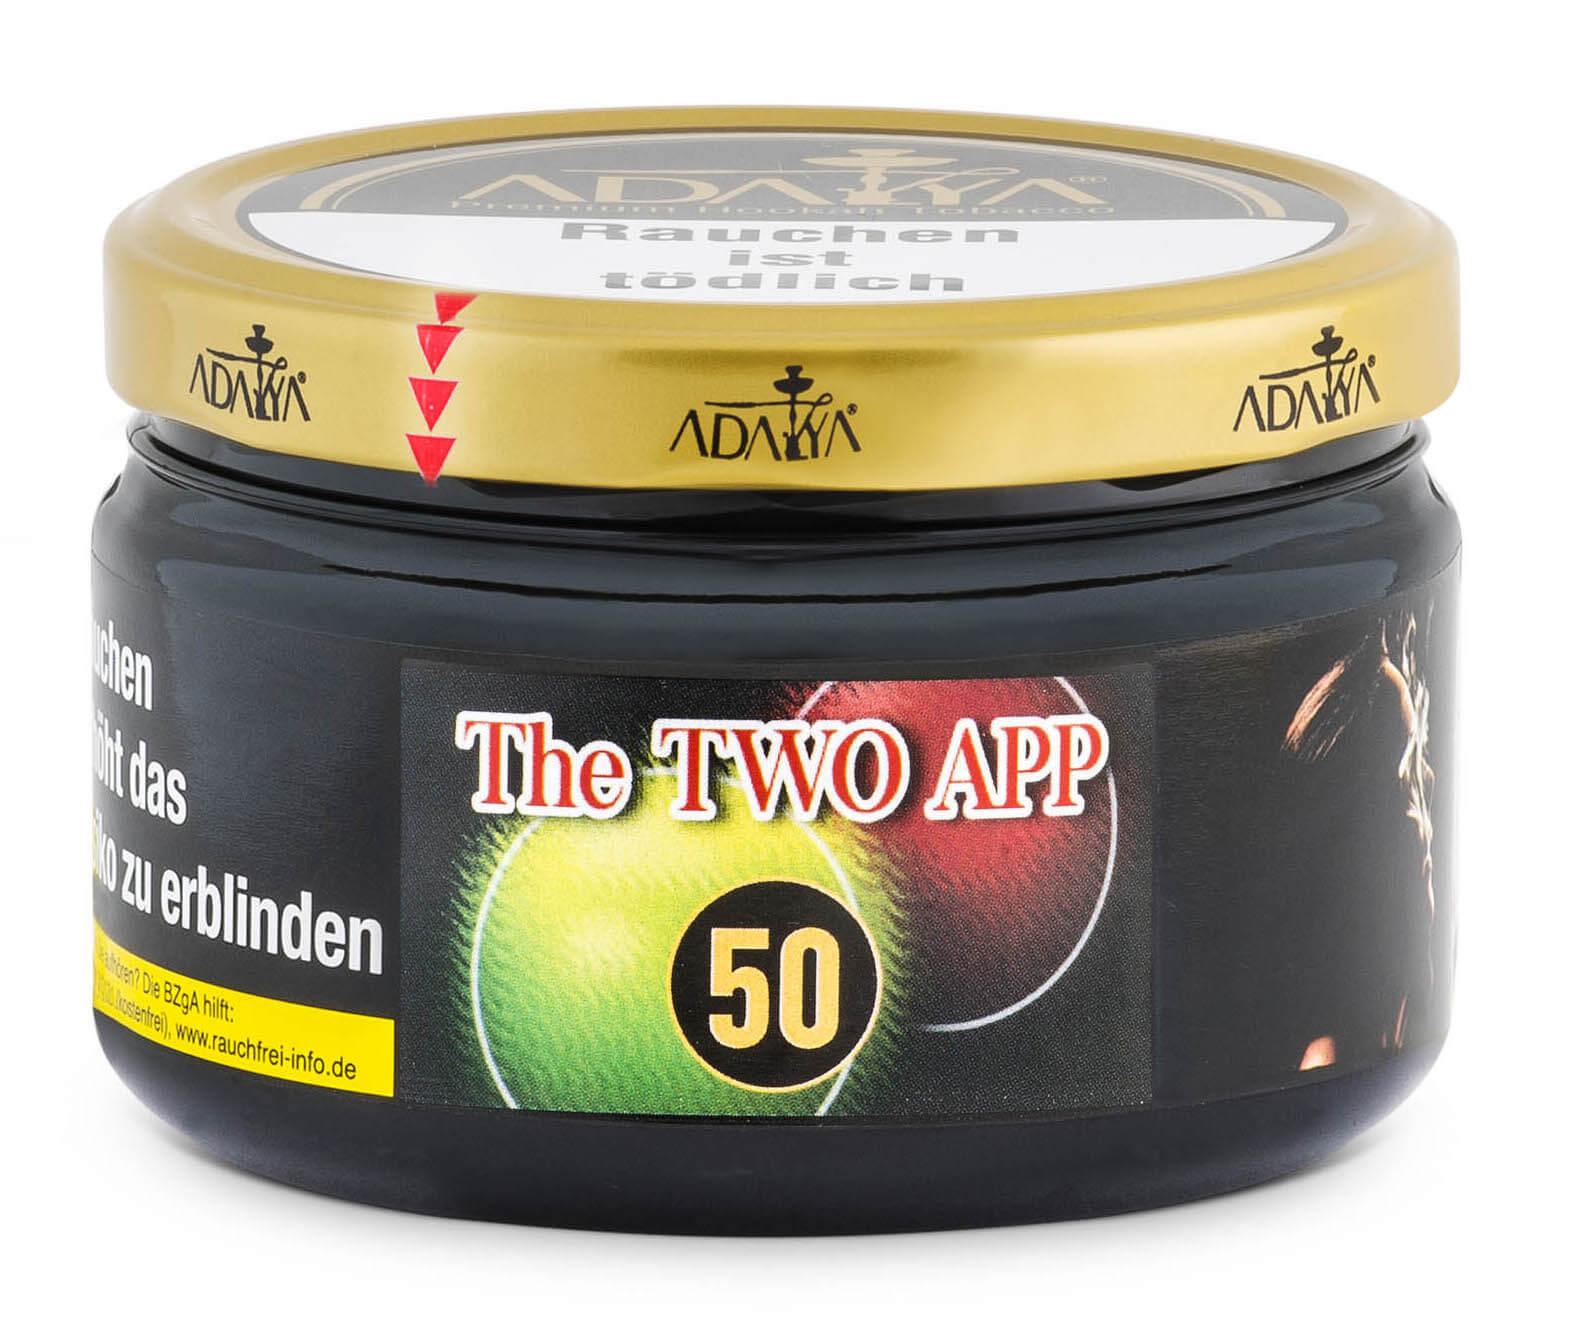 Adalya Tabak The Two App #50 200g